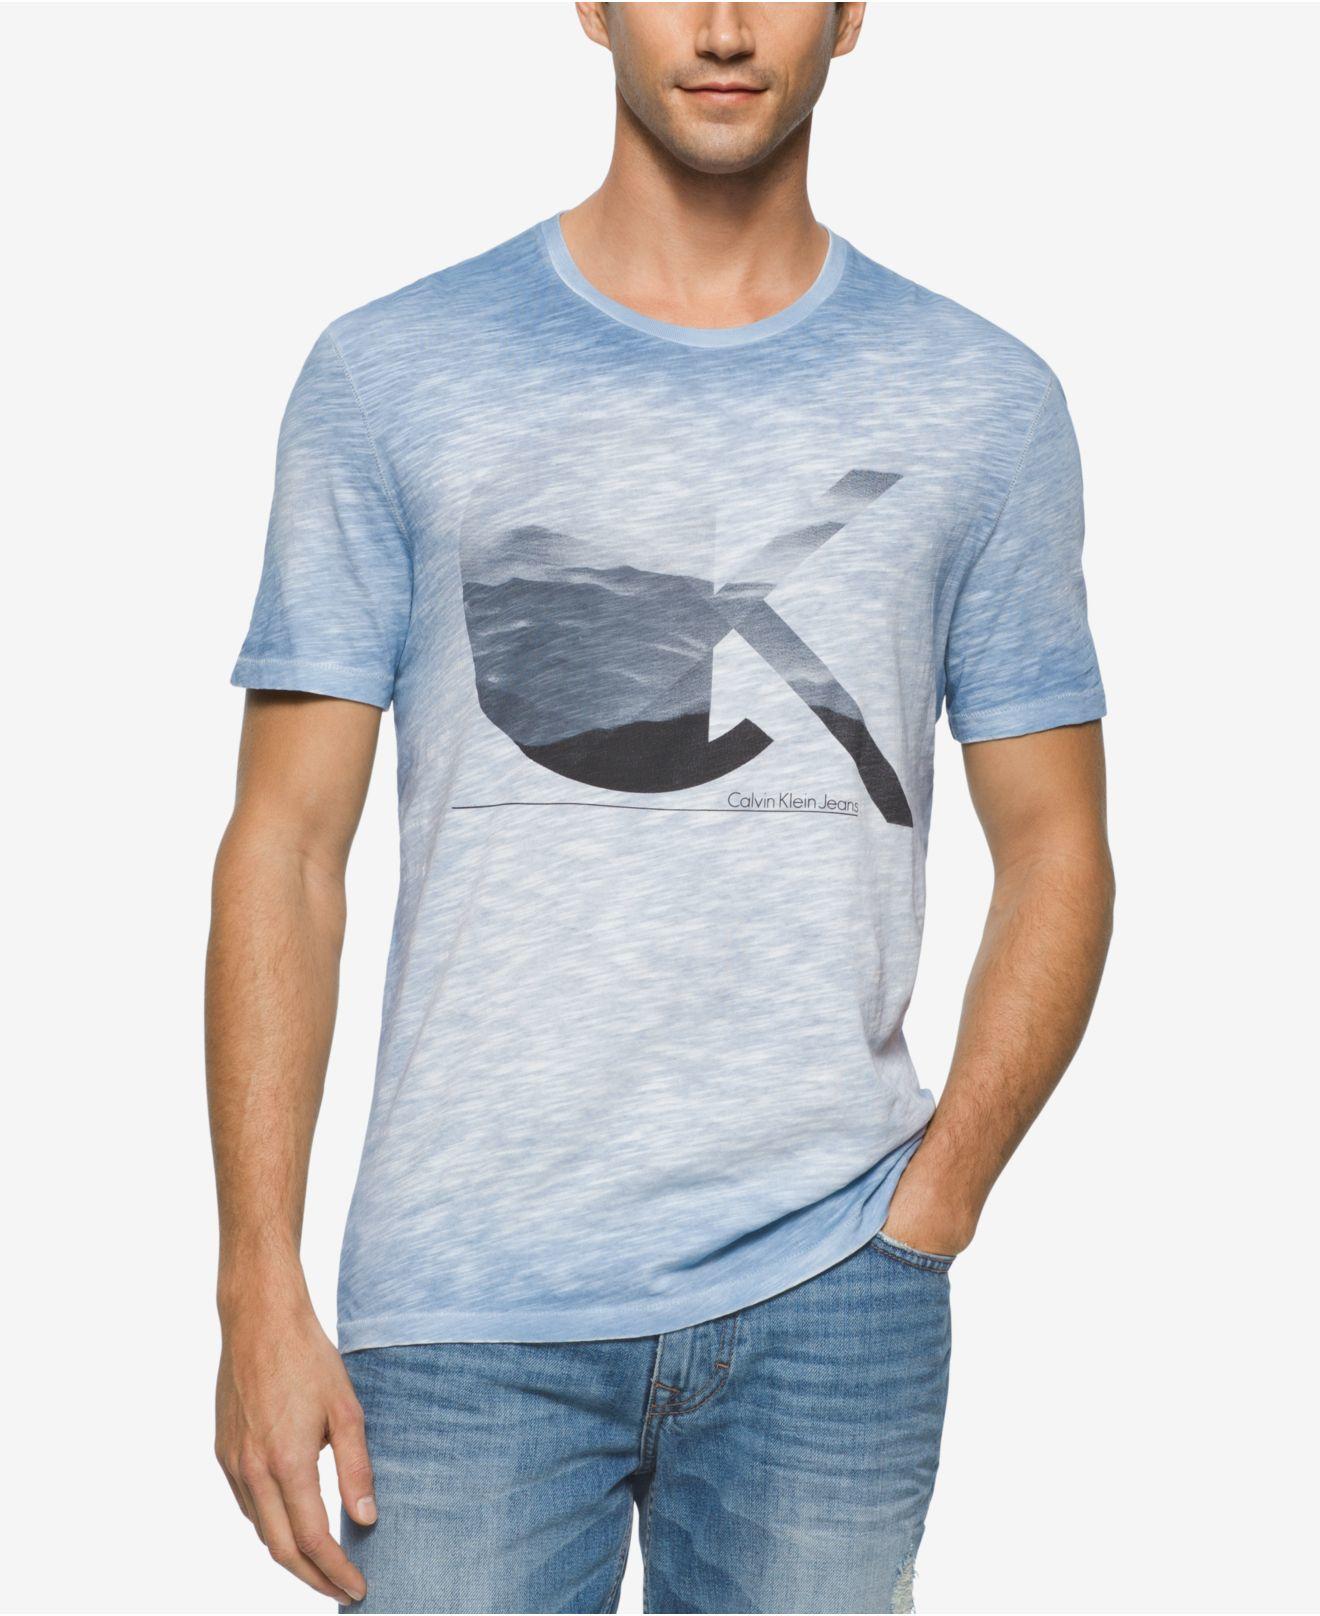 calvin klein jeans men 39 s clouds crew neck t shirt in blue for men lyst. Black Bedroom Furniture Sets. Home Design Ideas